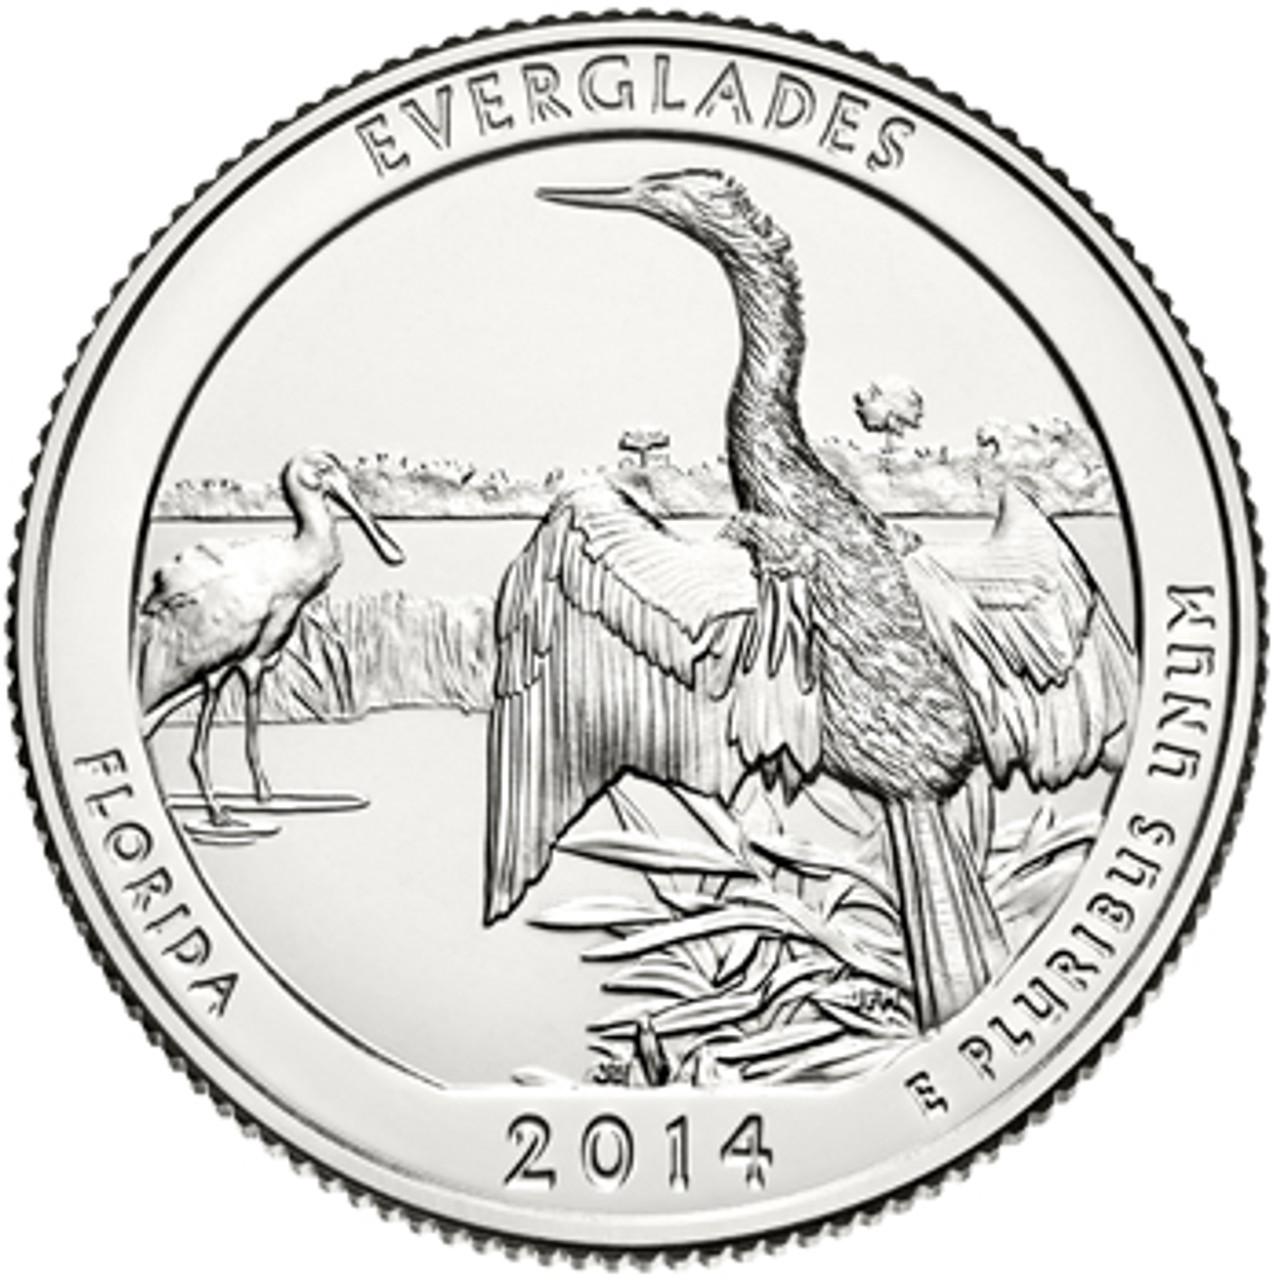 2014-D Everglades National Park Quarter Brilliant Uncirculated Image 1